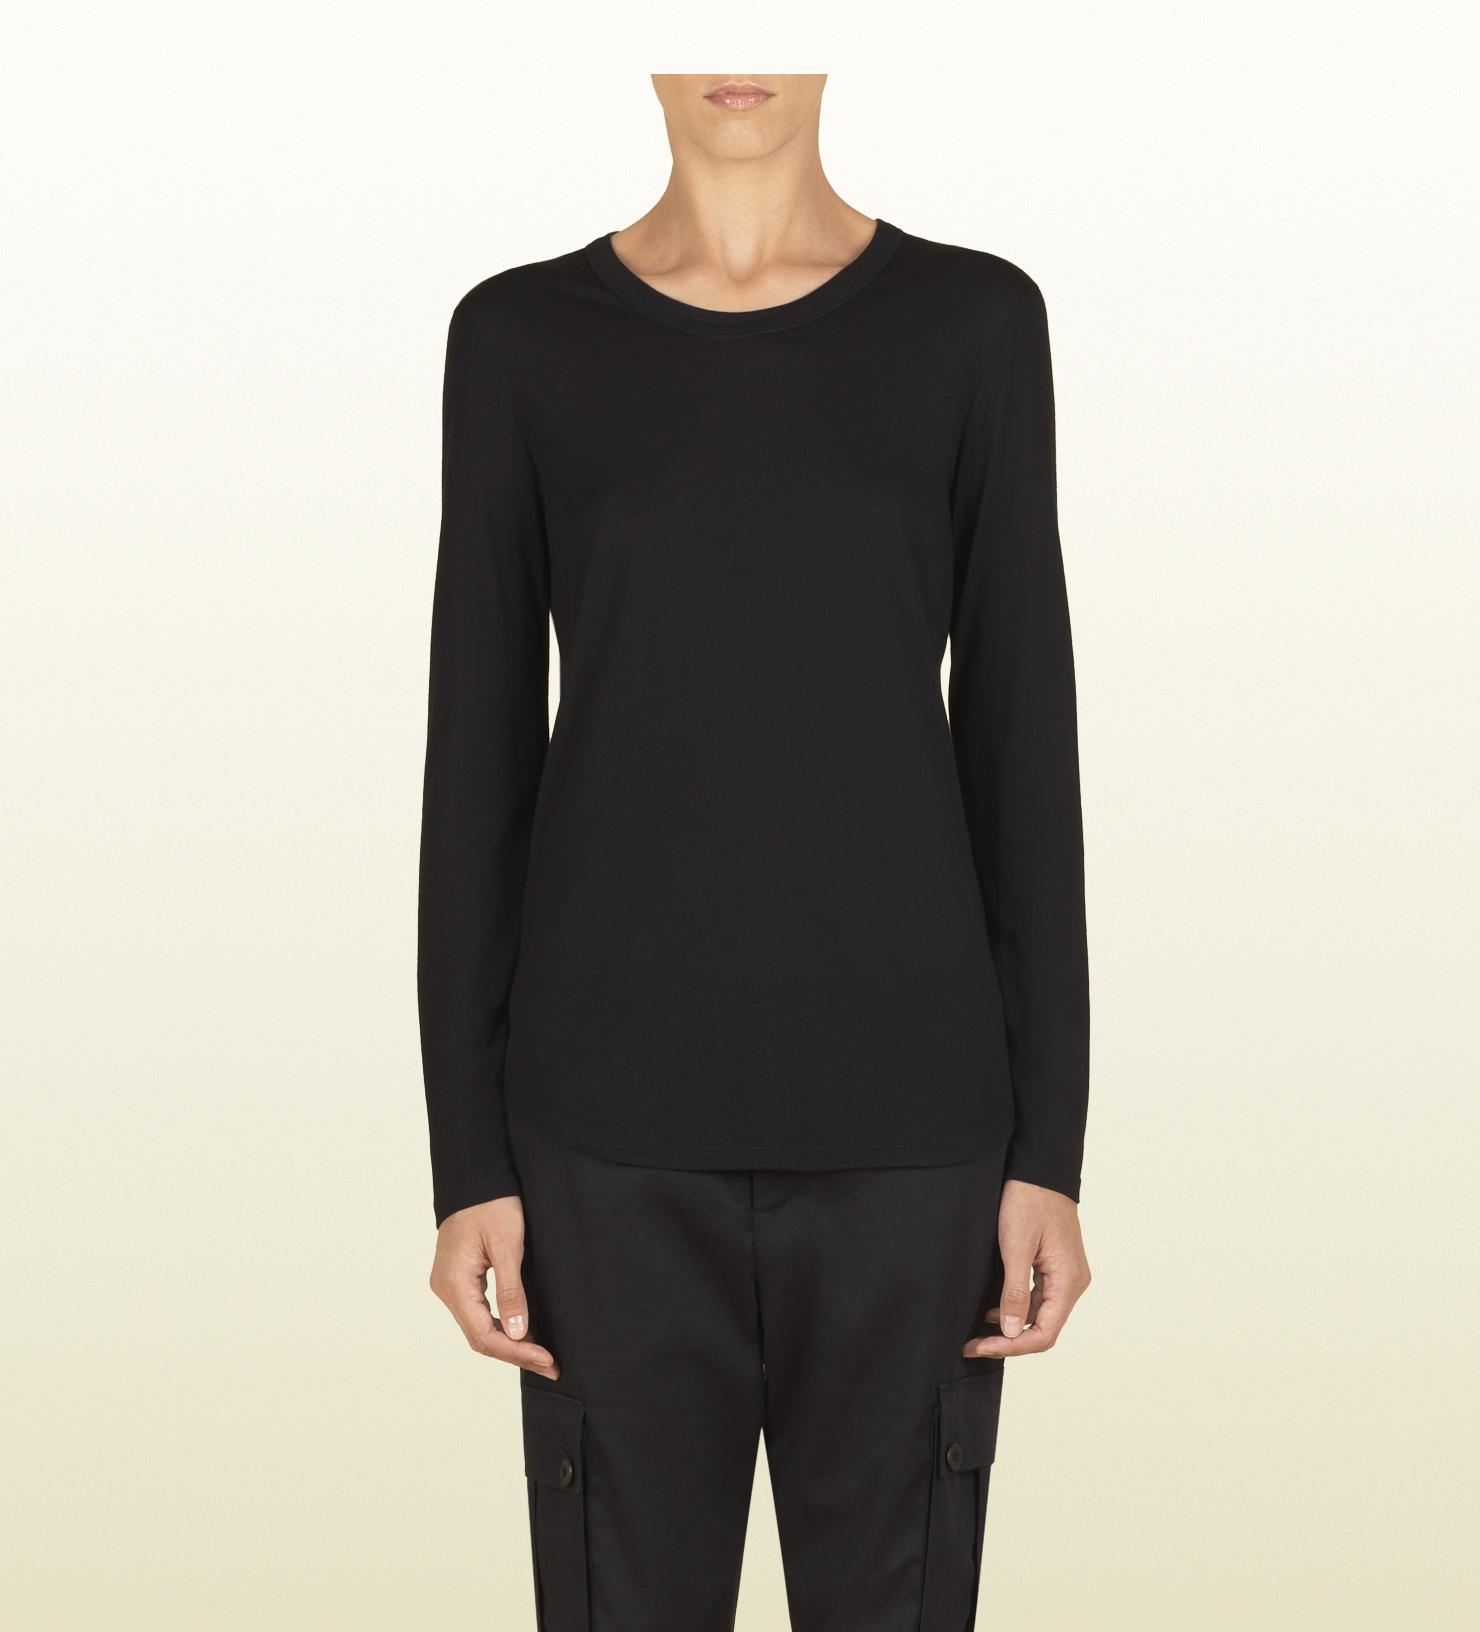 Gucci Women's Black Silk Jersey Long Sleeve T-shirt From Viaggio ...